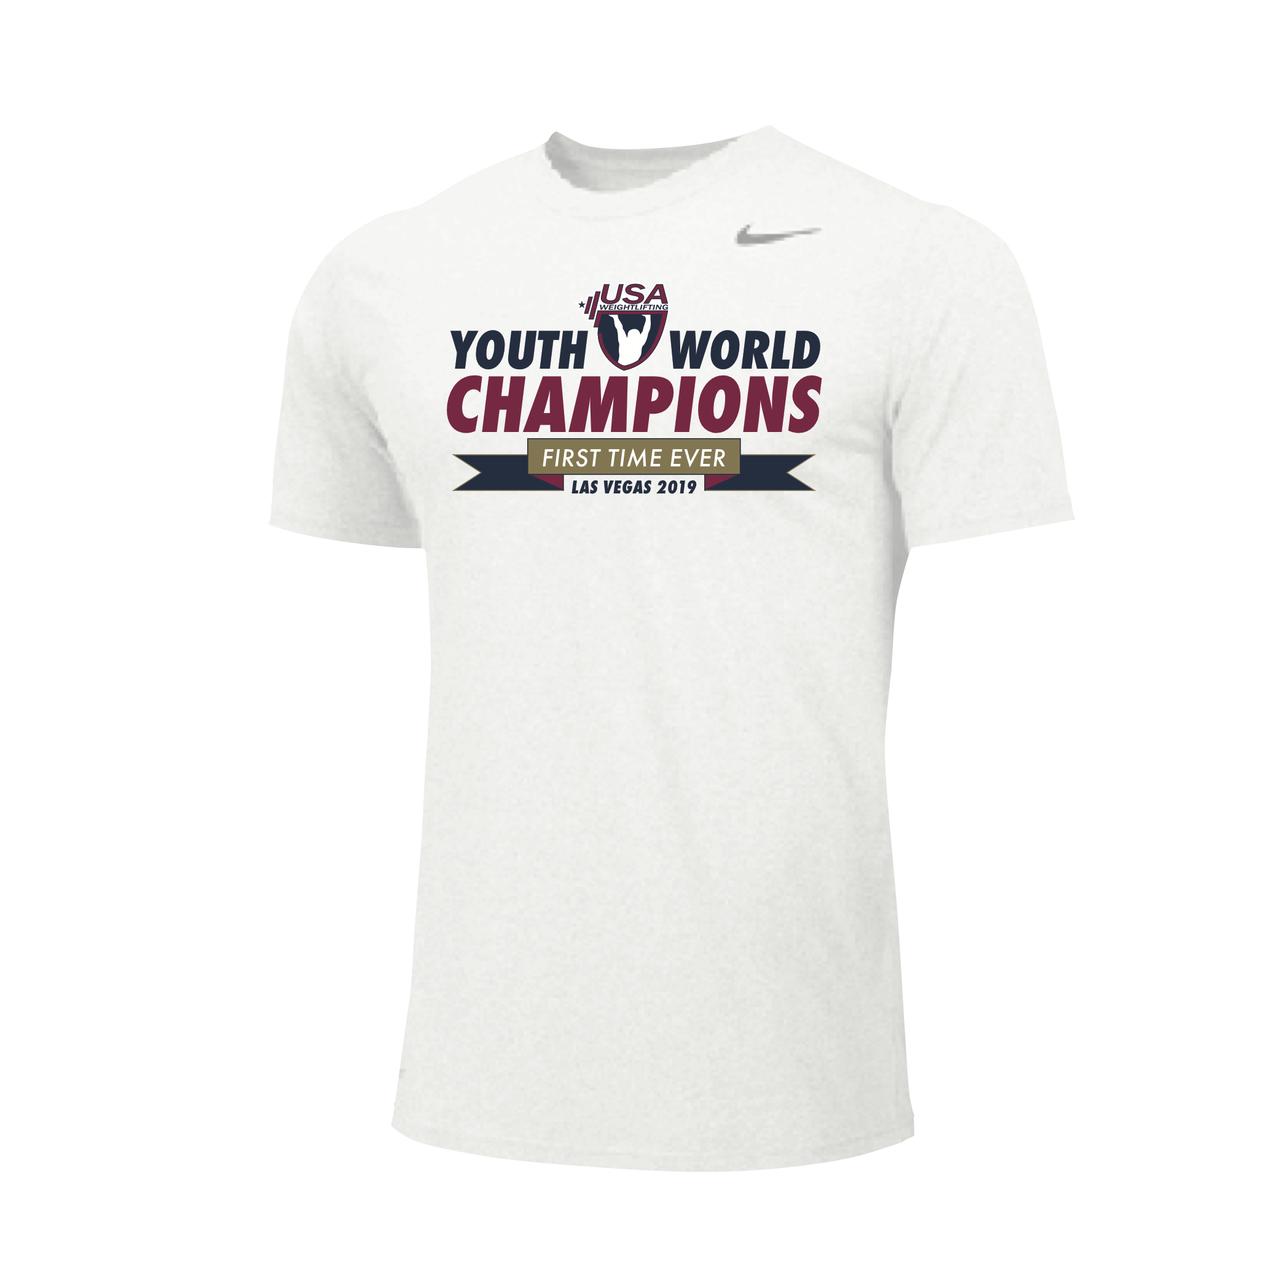 1078743da789 Nike Men s USAW IWF Youth Worlds Championship Legend Tee - White